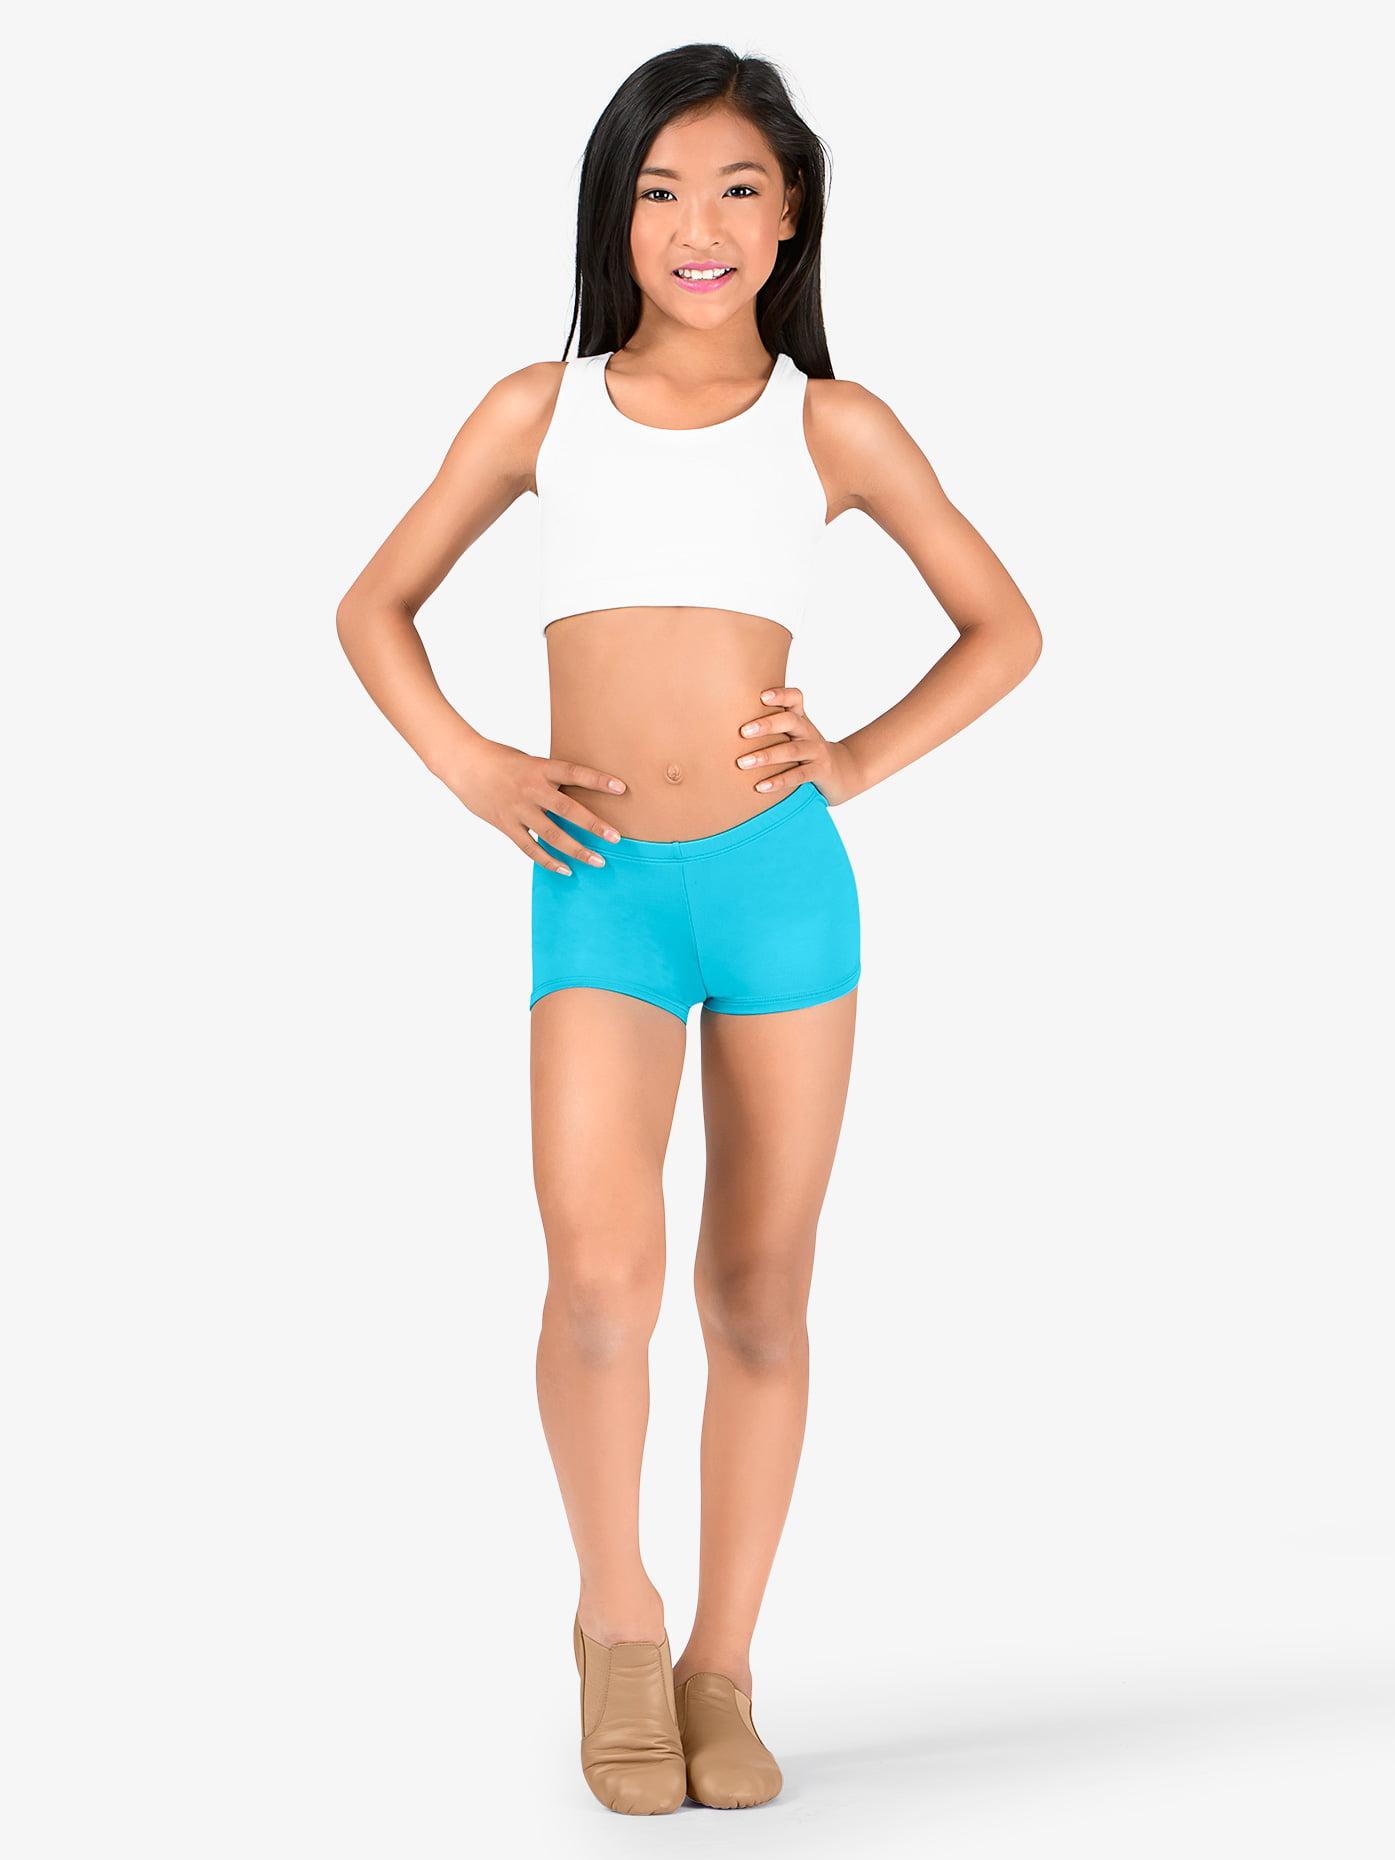 Body Wrappers Prowear Boy-Cut Waistband Shorts []